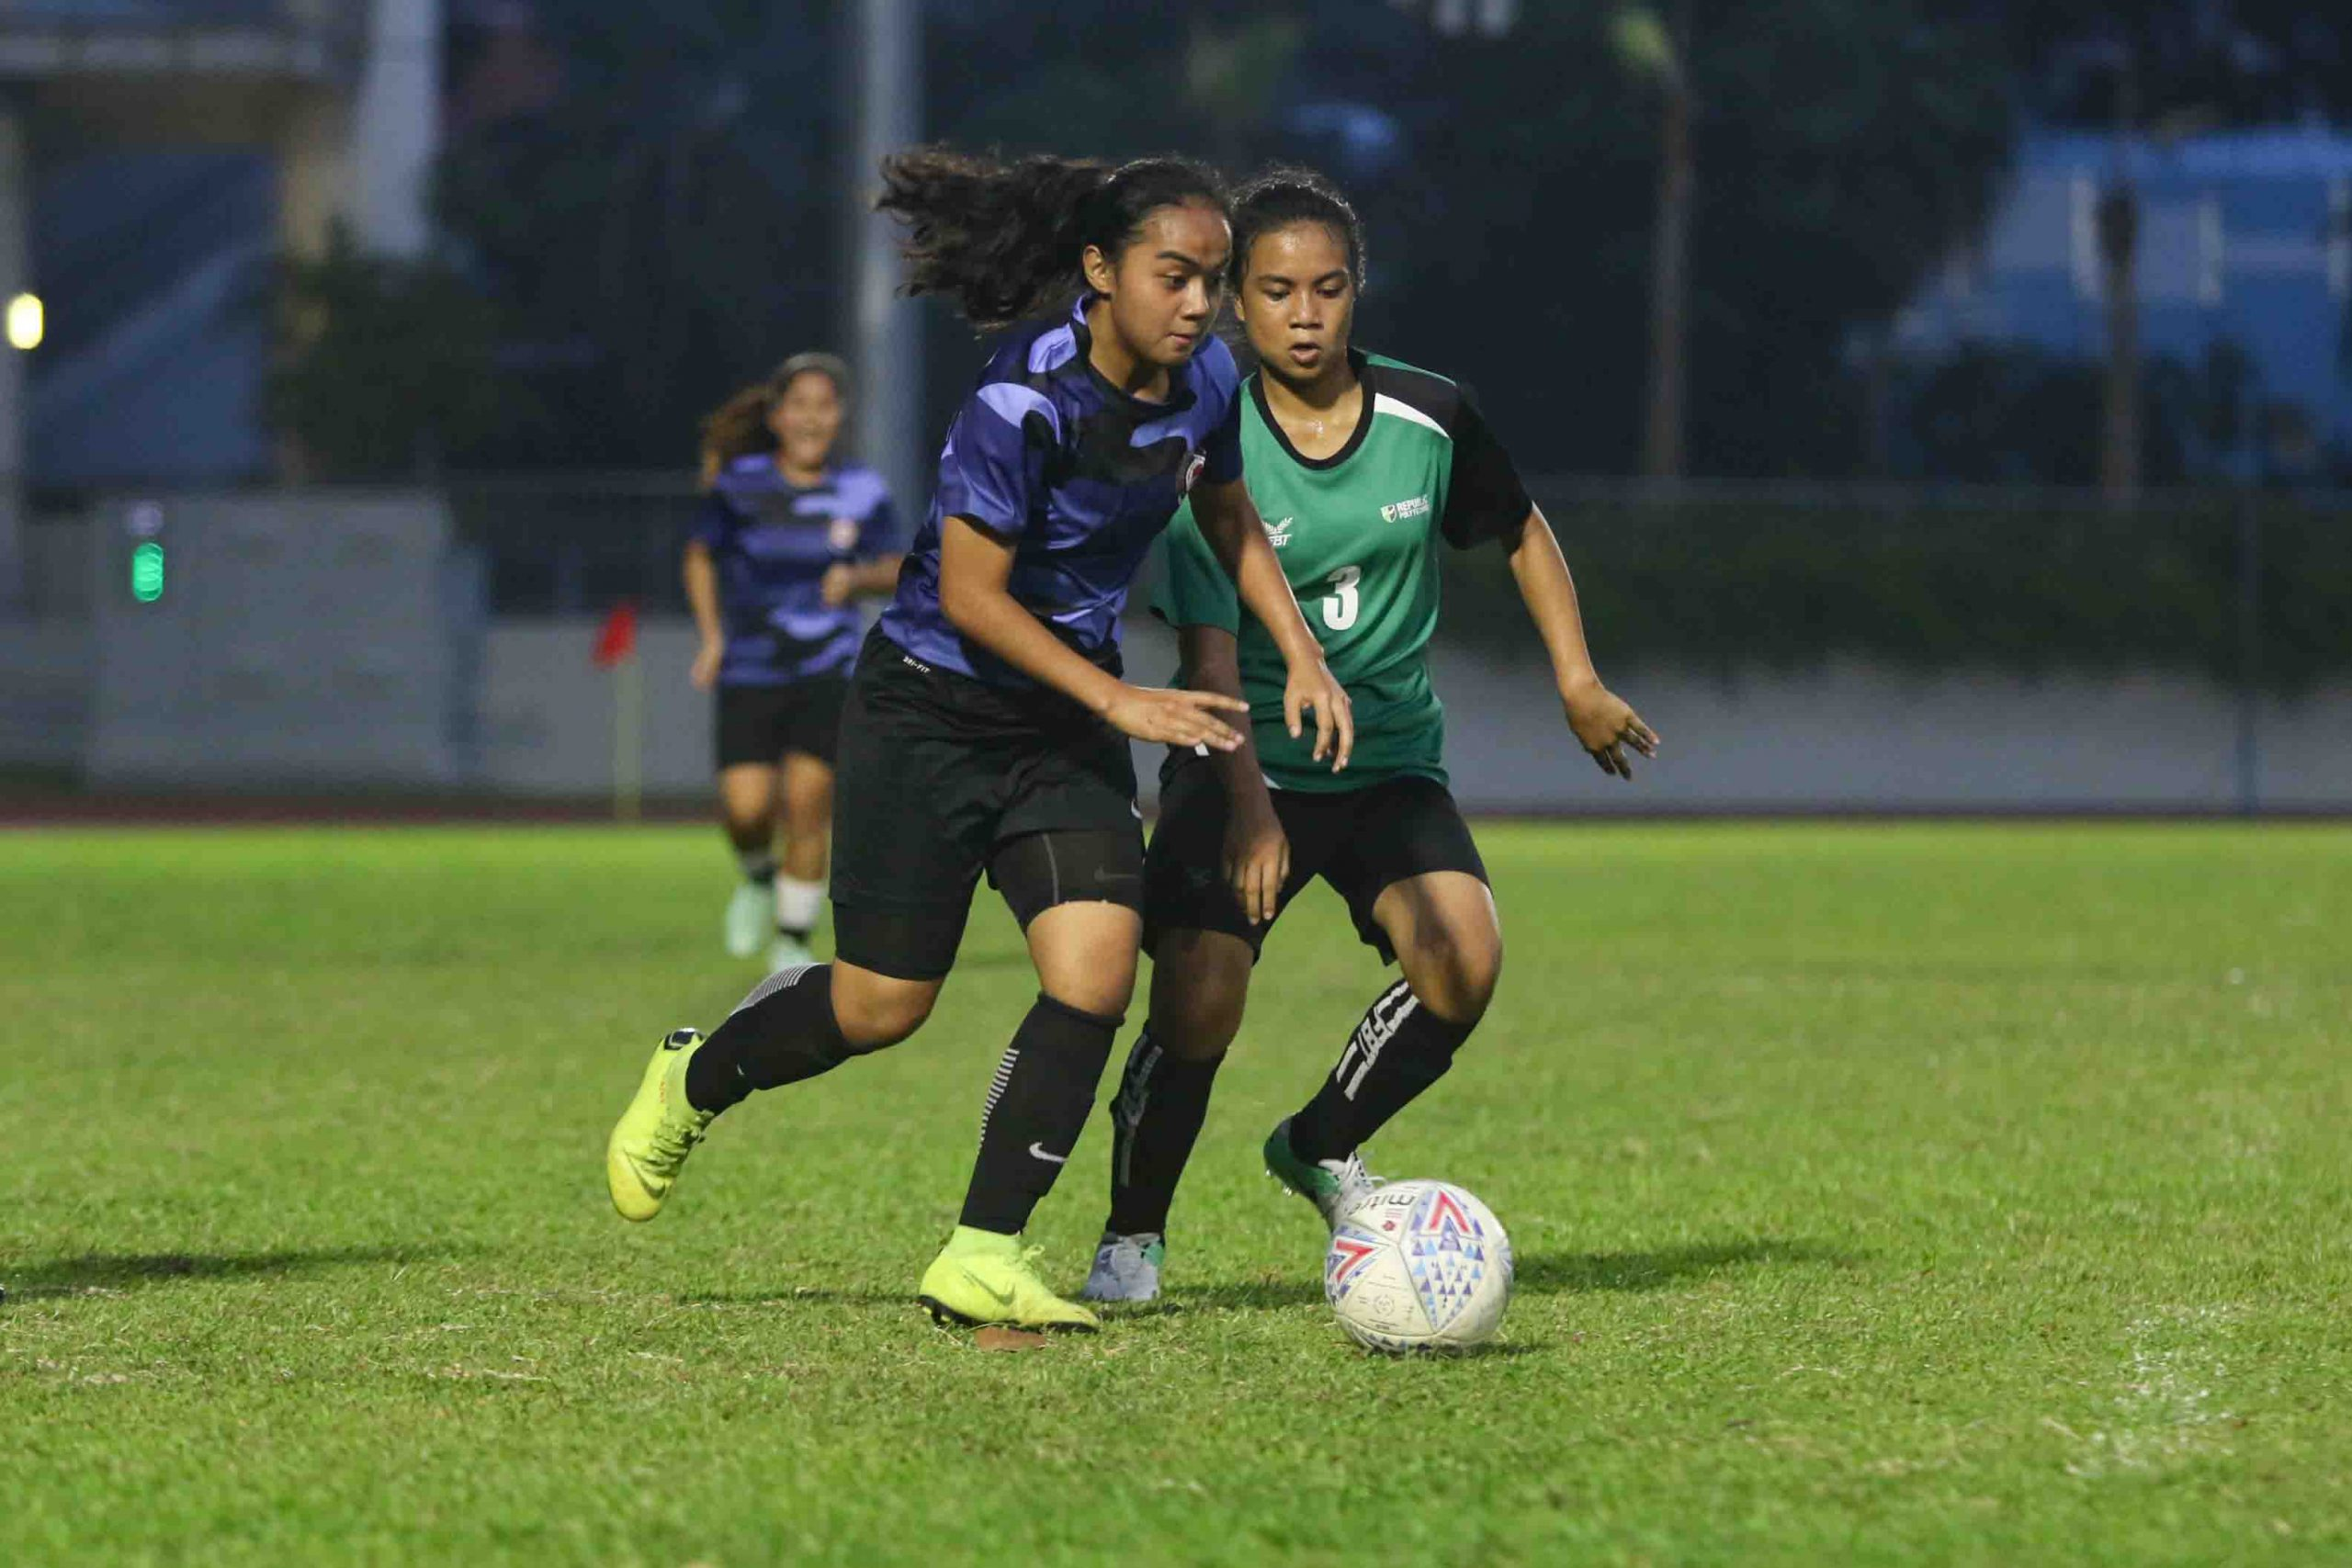 Siti Nor Aqilah Binte Md Shazali (ITE #14) dribbles the ball under pressure from Nurul Ardian Binte Baharrudin (RP #3). (Photo 2 © Clara Lau/Red Sports)